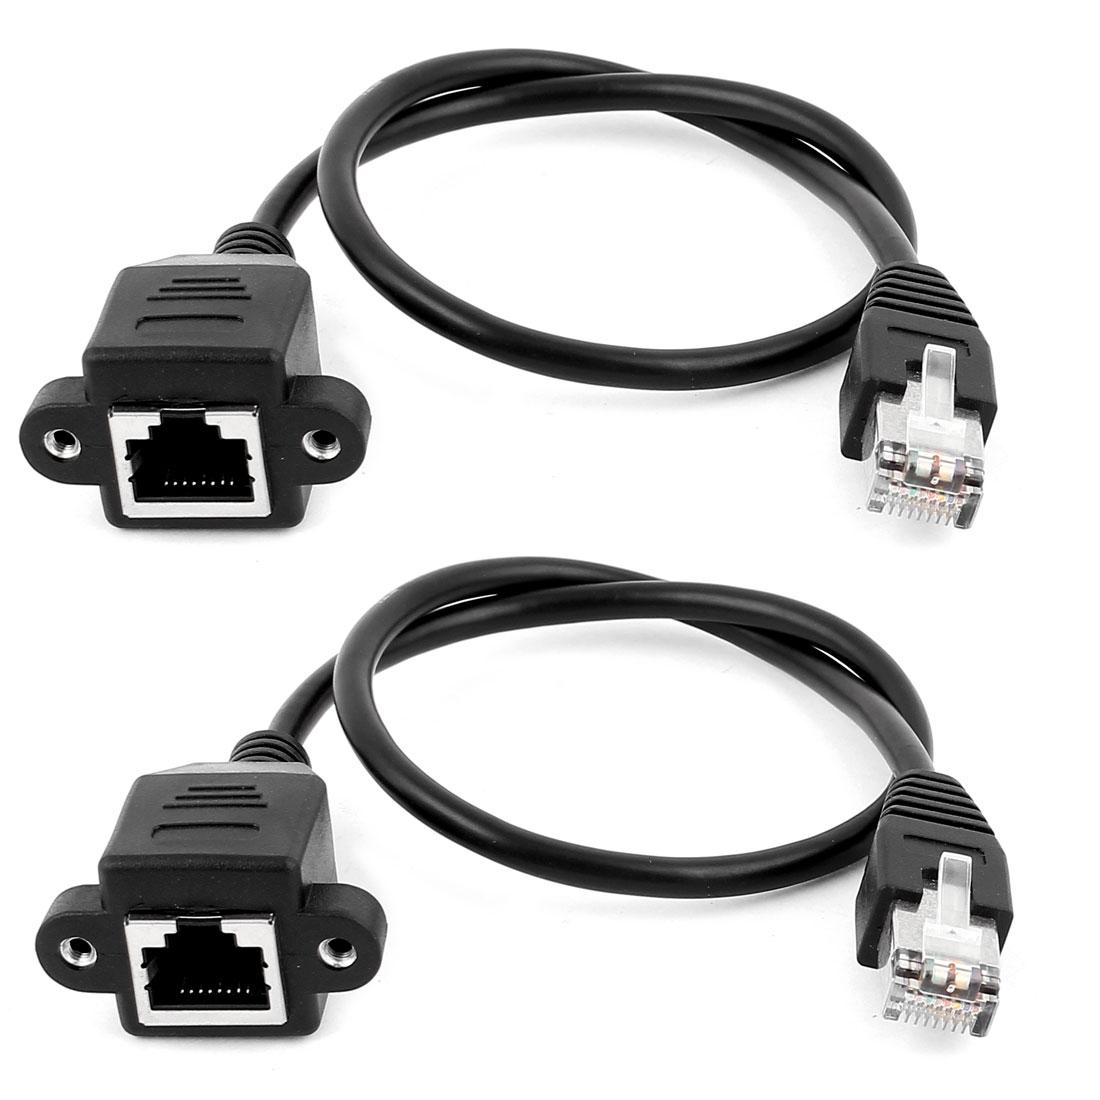 2Pcs 30cm Long RJ45 Male to Female M/F CAT5E LAN Ethernet Adapter Network Cable